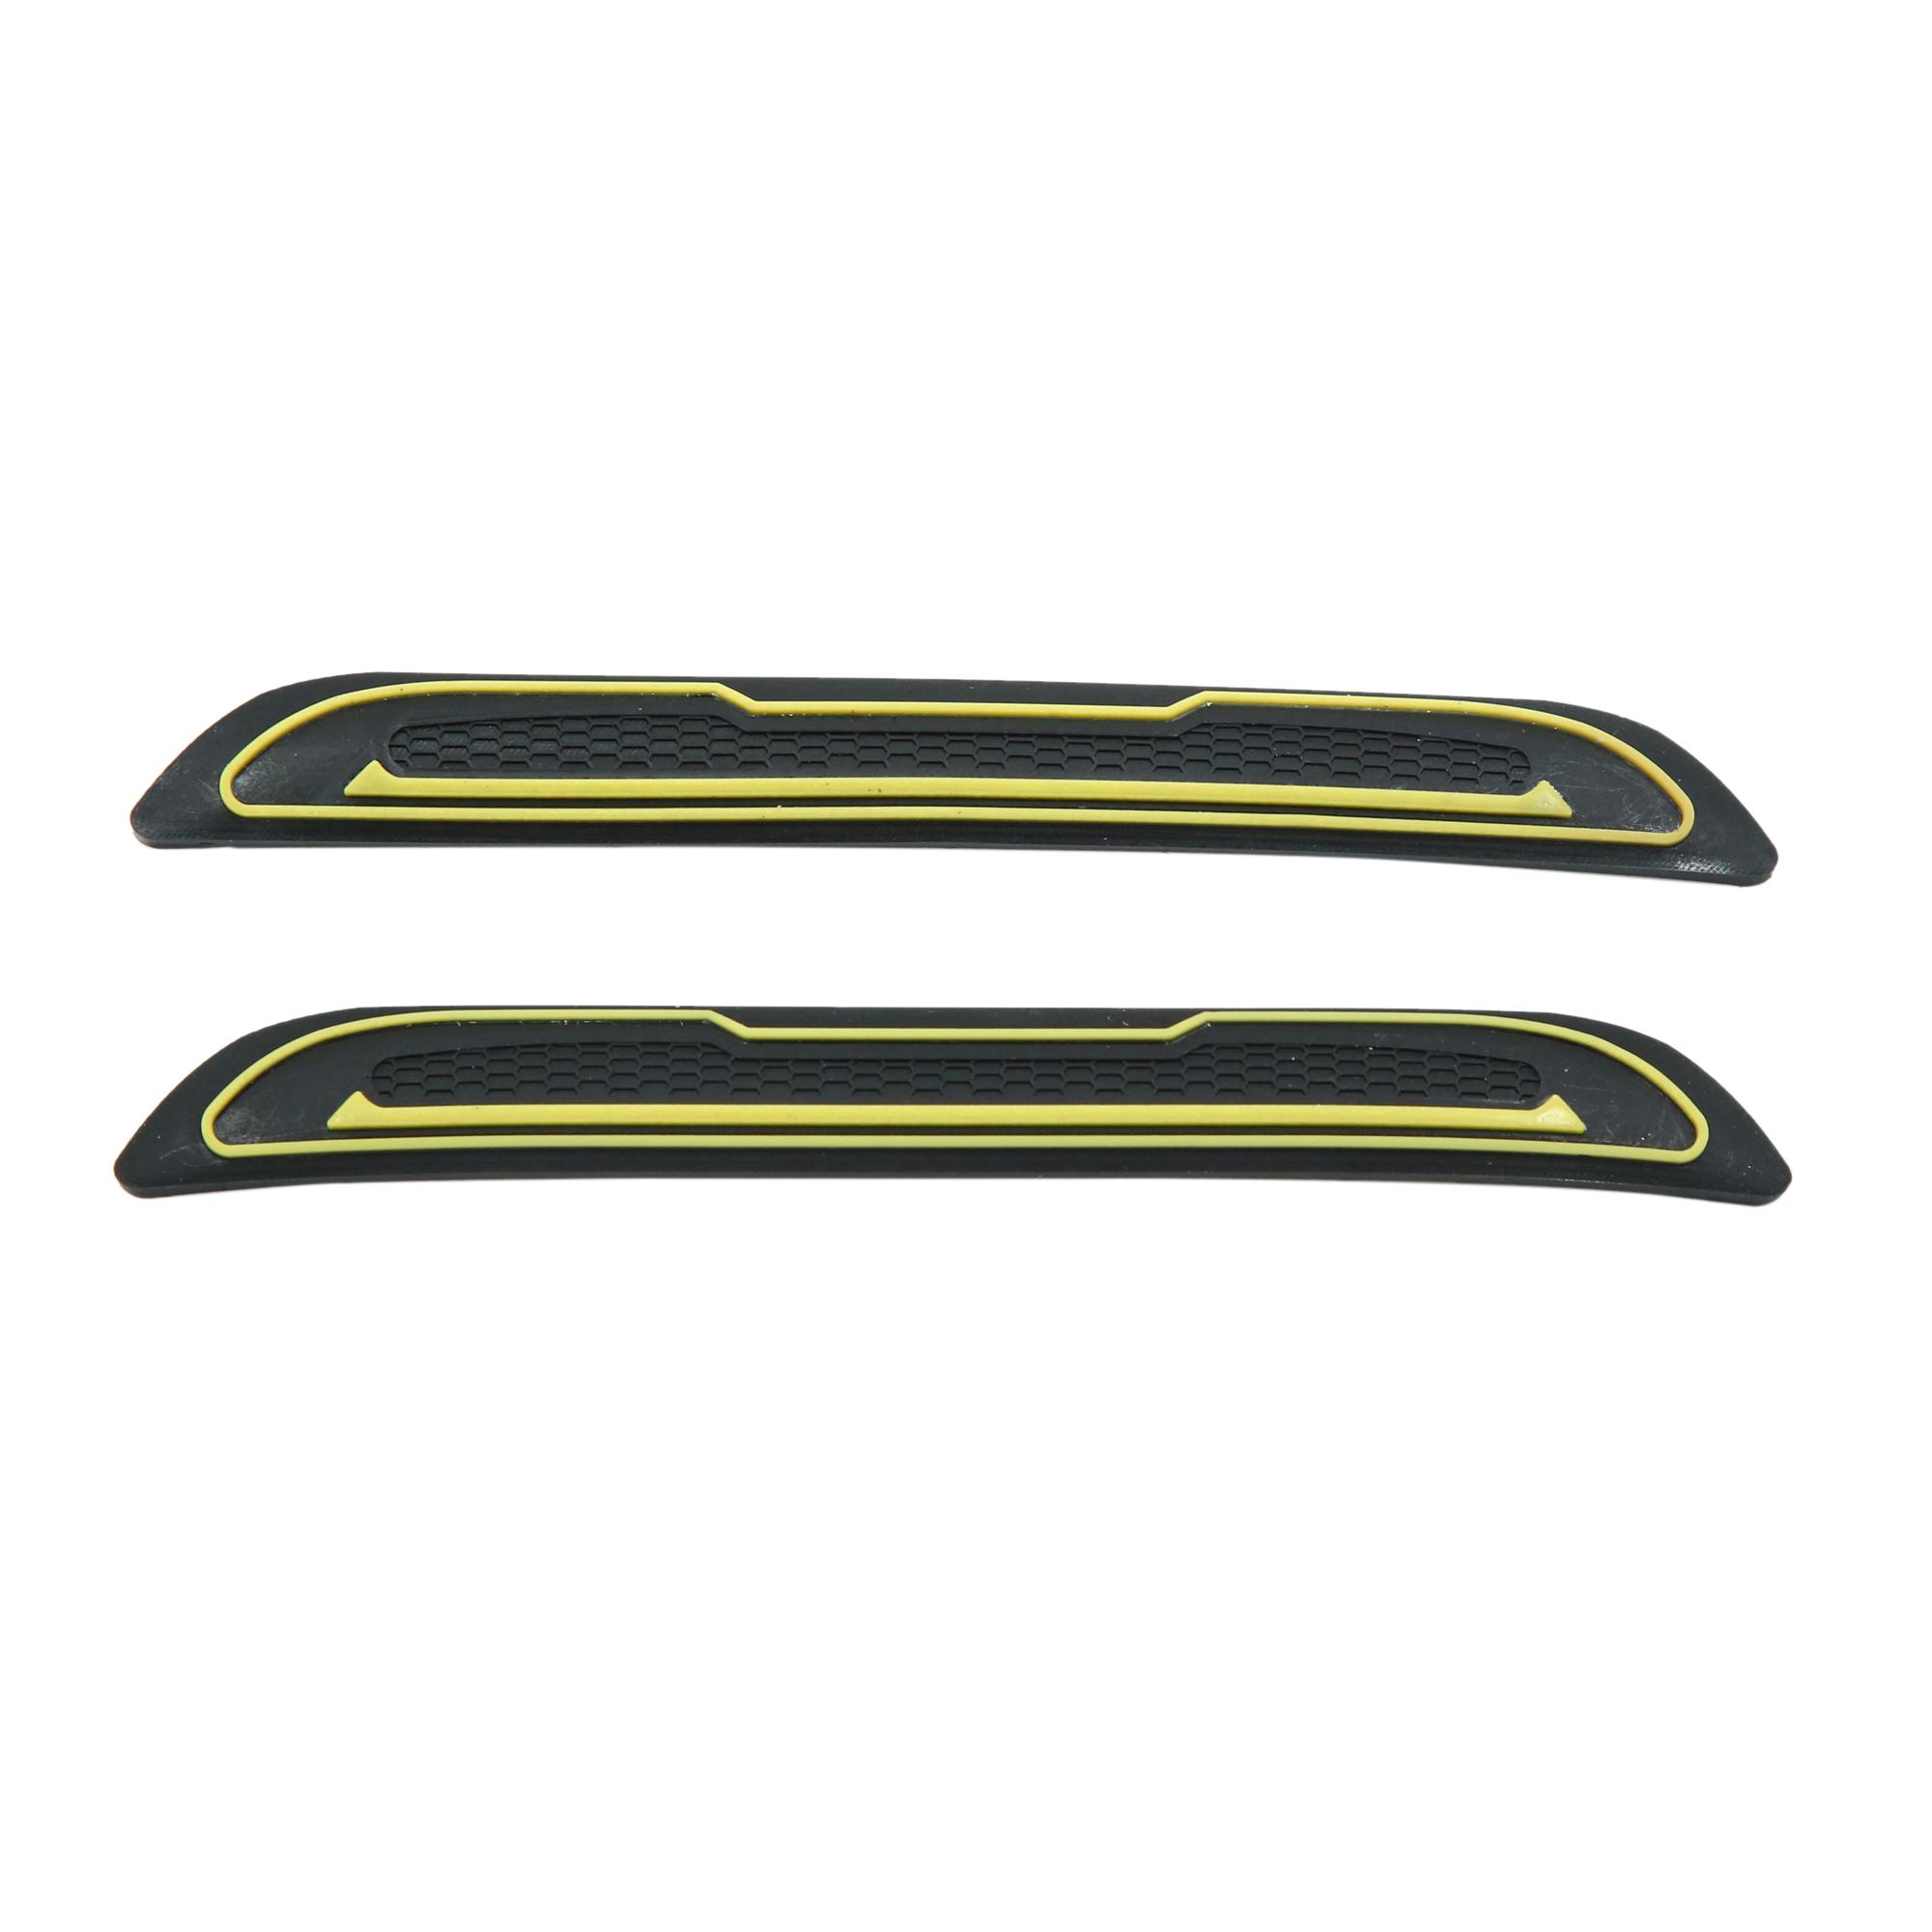 4pcs Yellow Car Door Edge Guards Trim Molding Protection Strip Scratch Protector - image 1 of 3